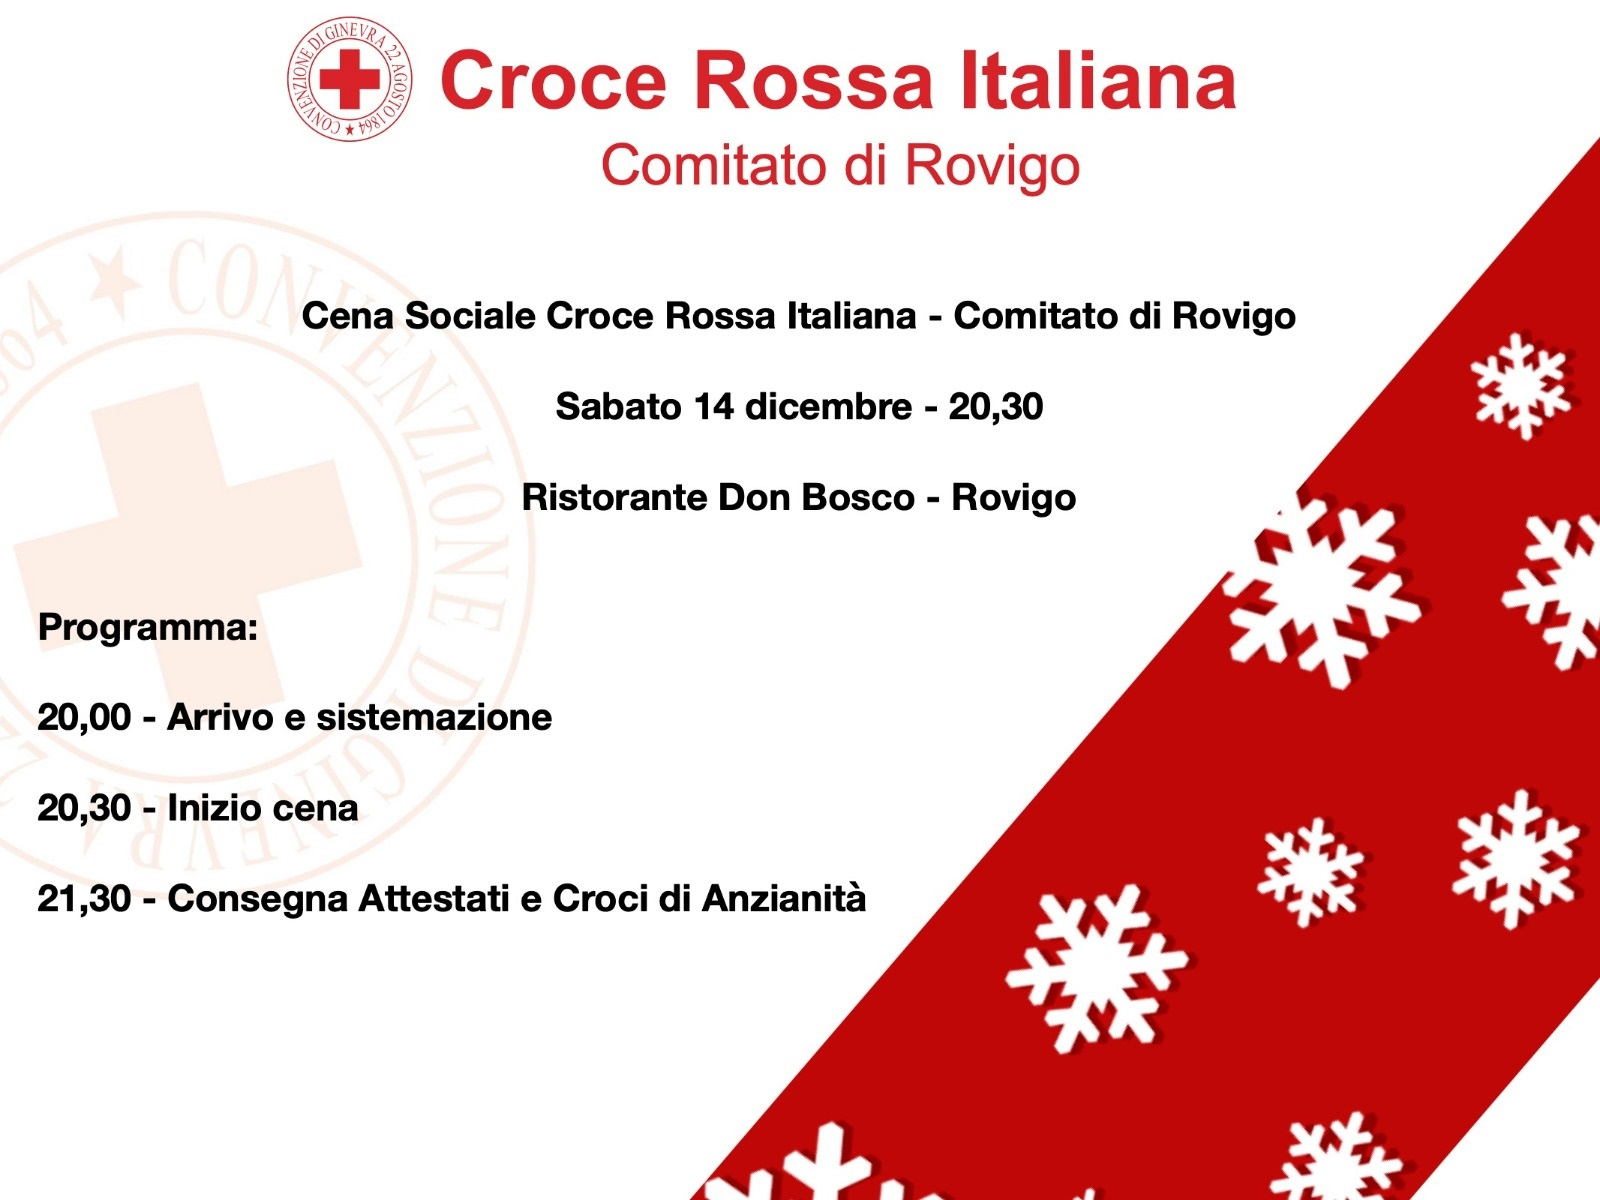 2019 - Cena sociale Croce Rossa Italiana